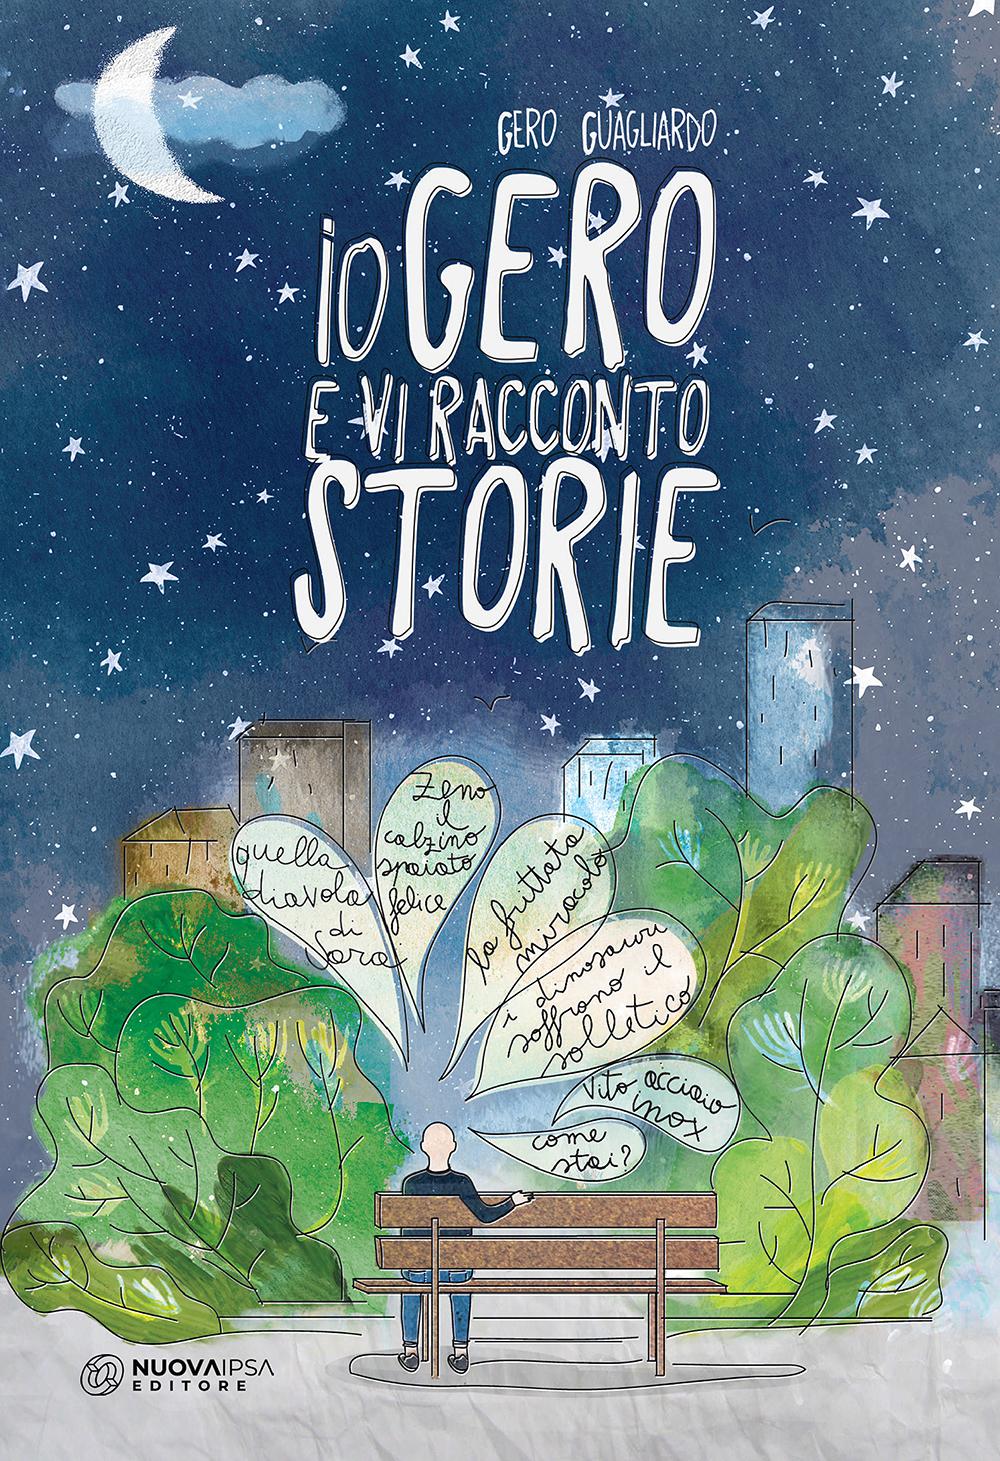 Io Gero e vi racconto storie